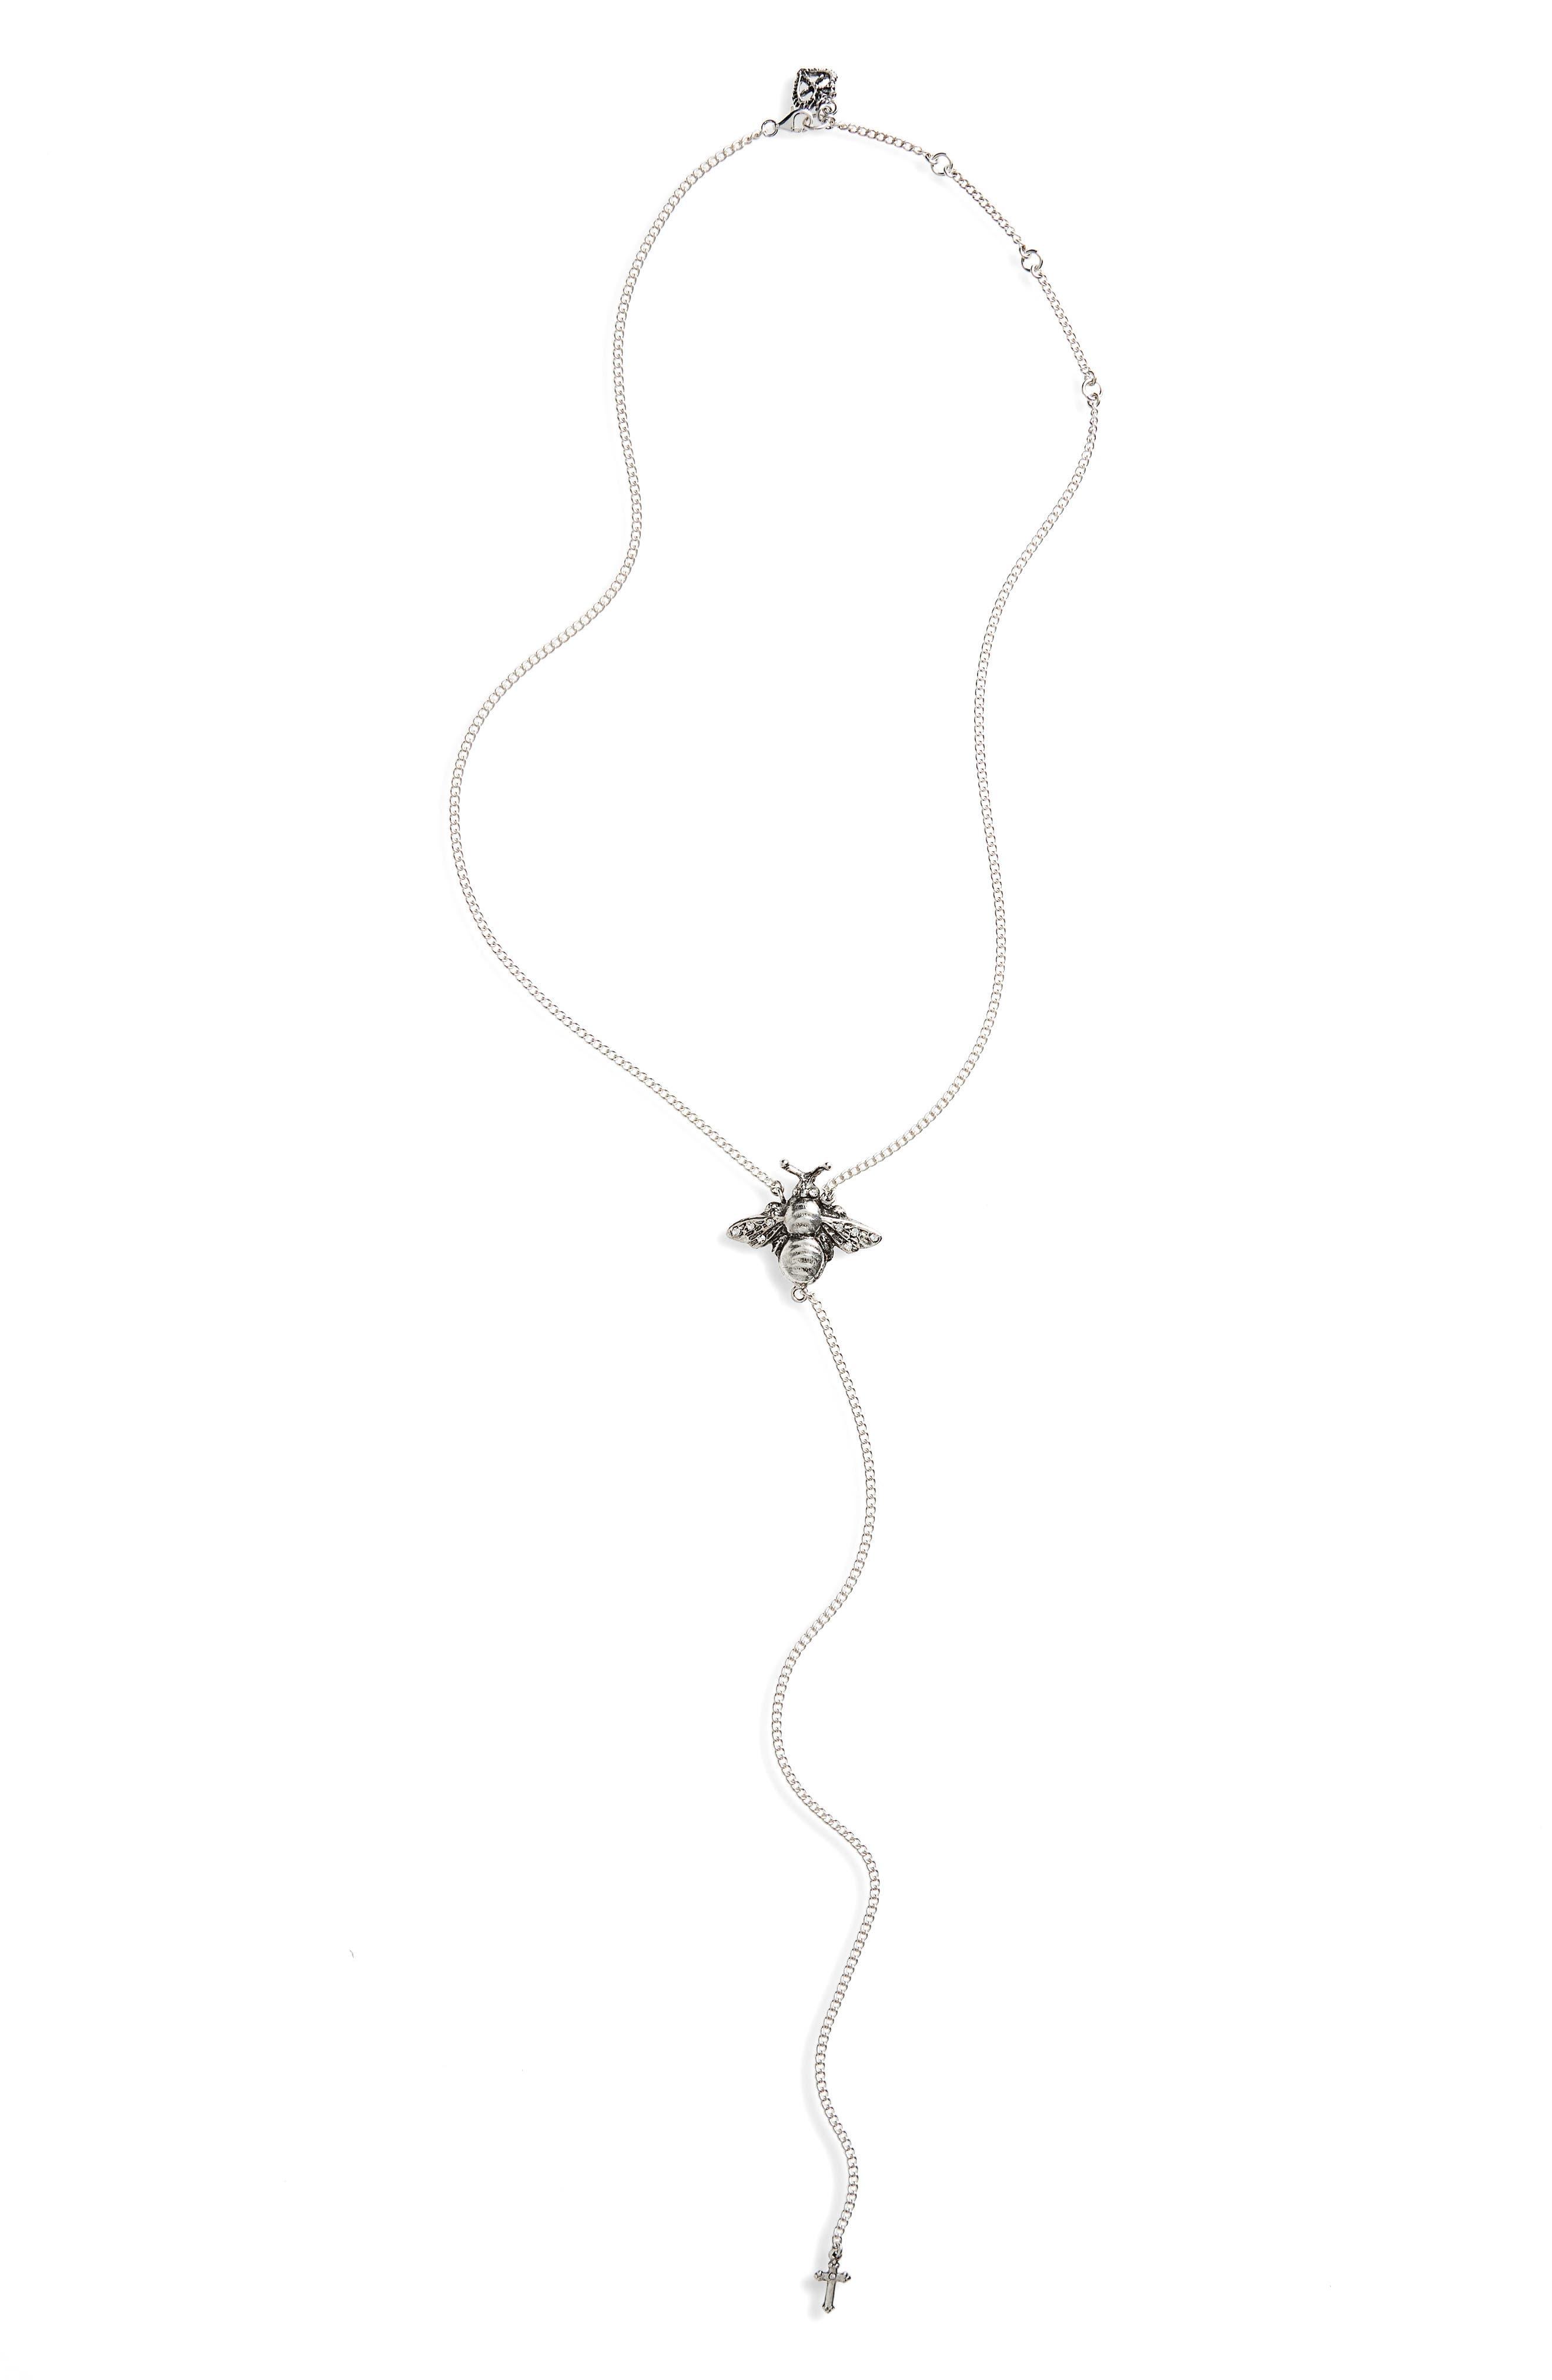 Main Image - Virgins Saints & Angels Bee Mine Y-Necklace